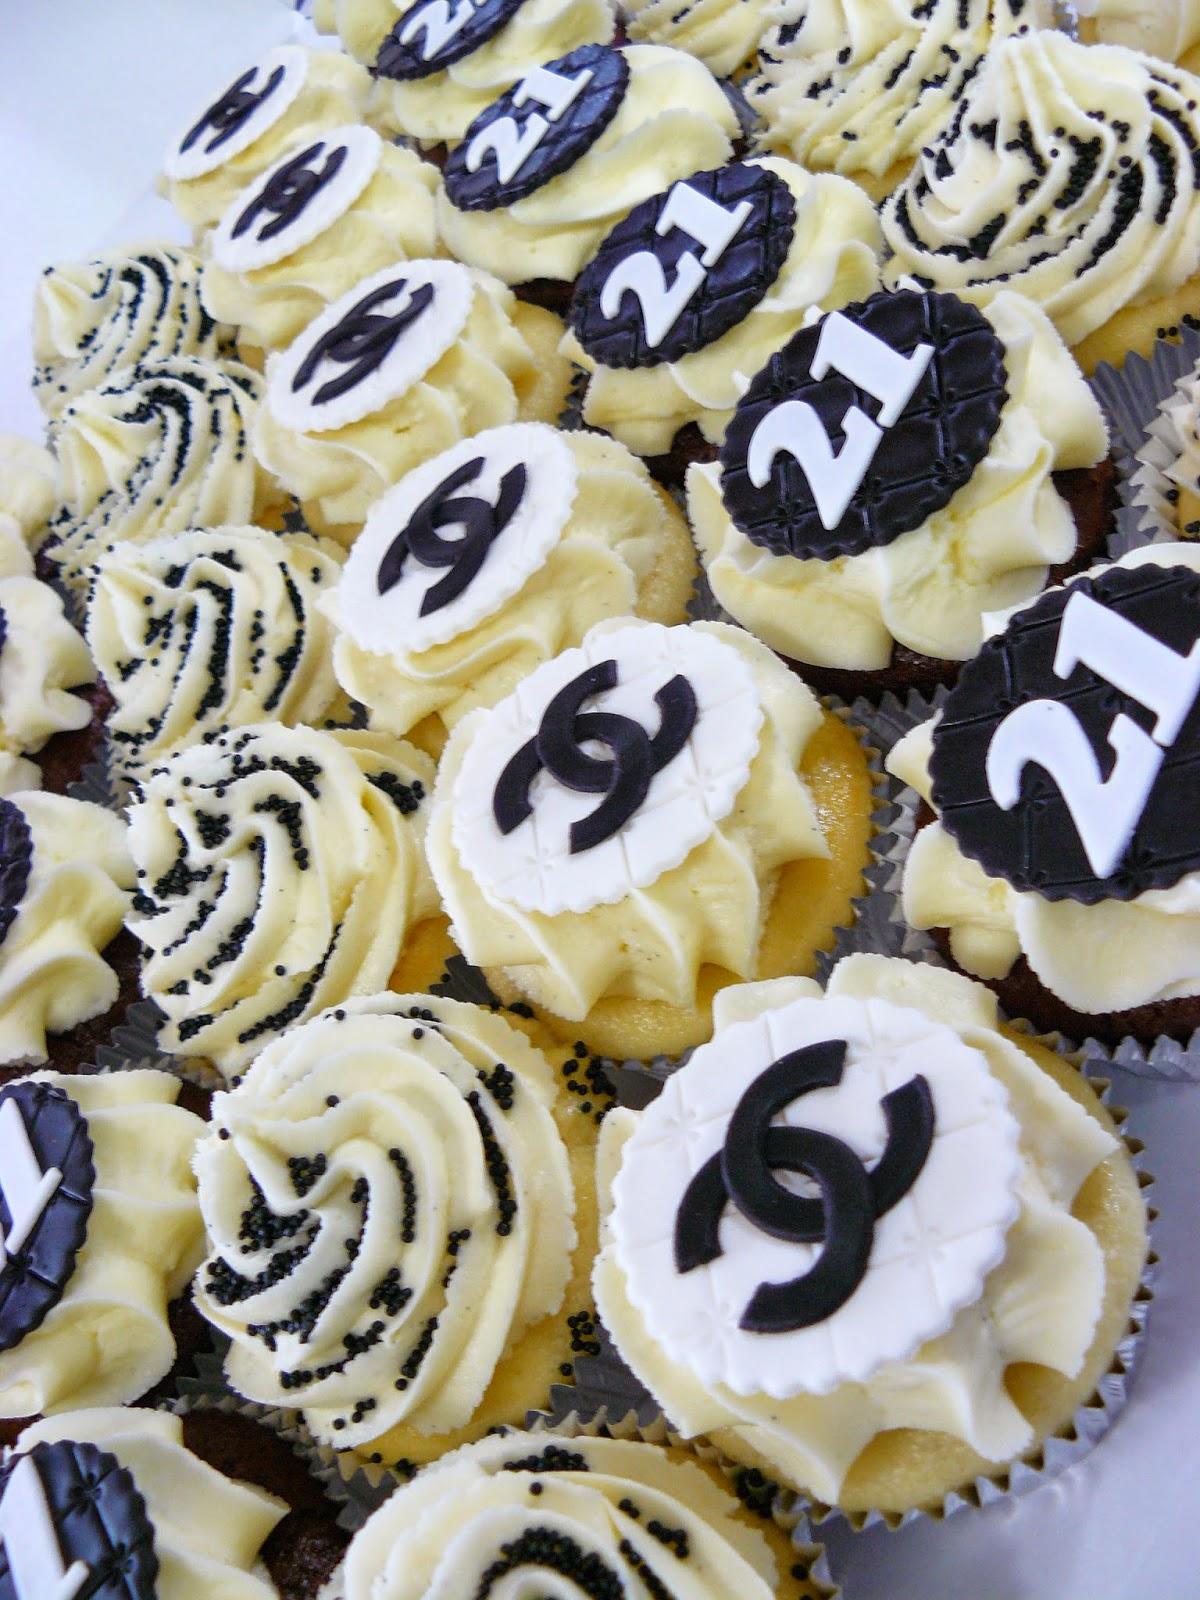 Chanel Cucakes